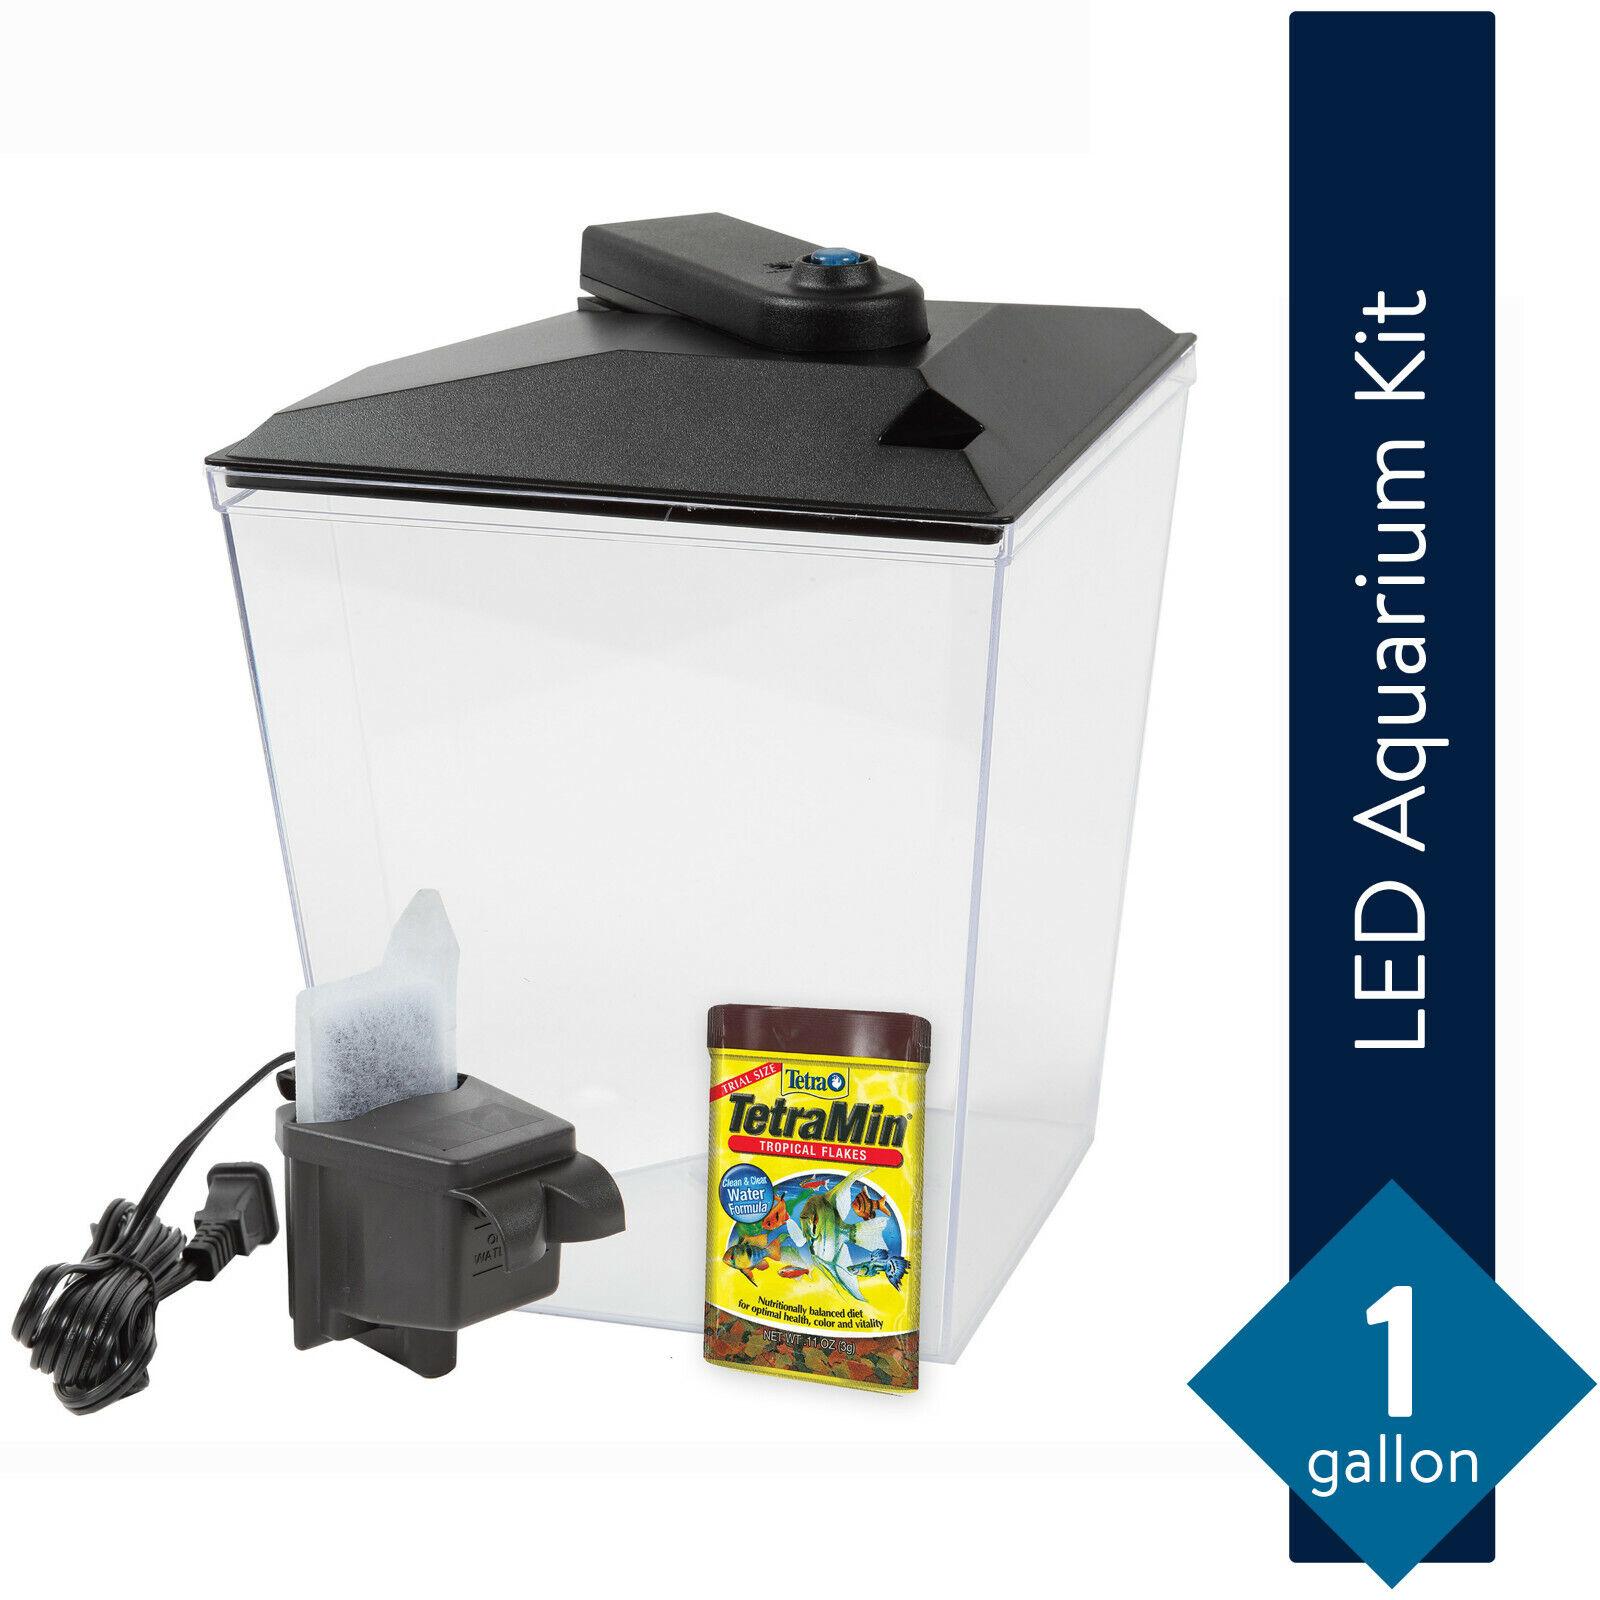 Aqua Culture One Gallon Aquarium Starter Kit with LED